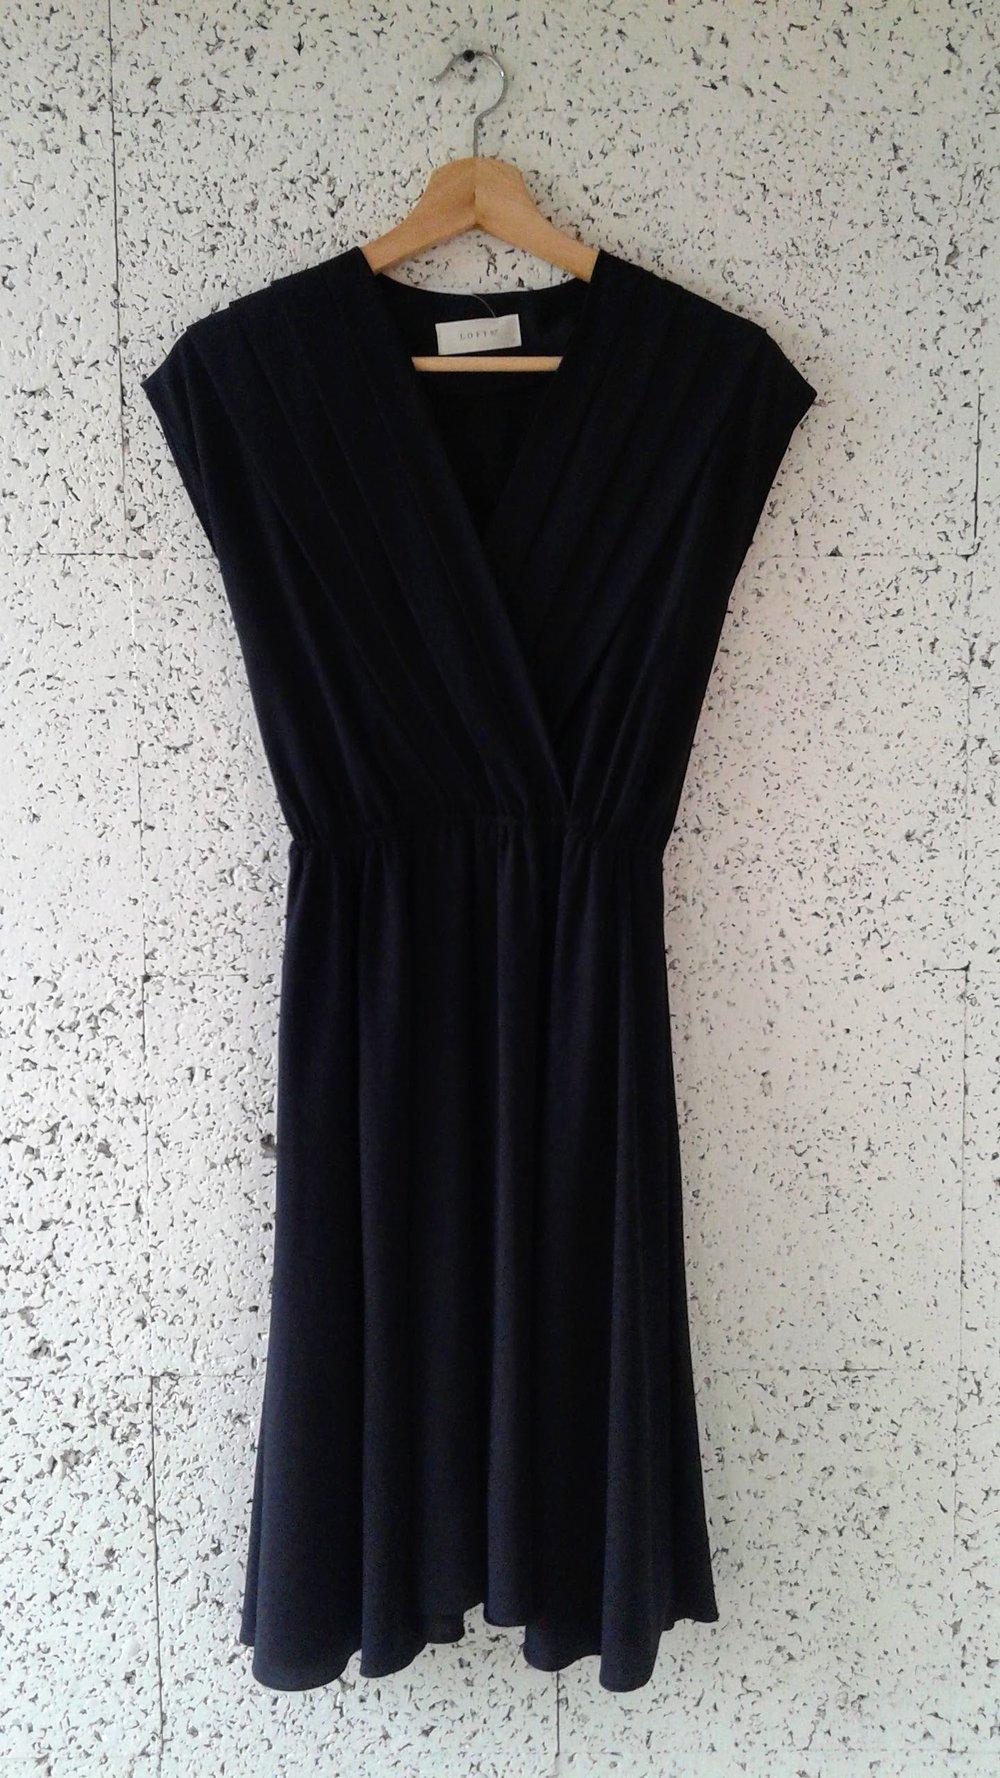 Loft 82 dress; Size S, $52